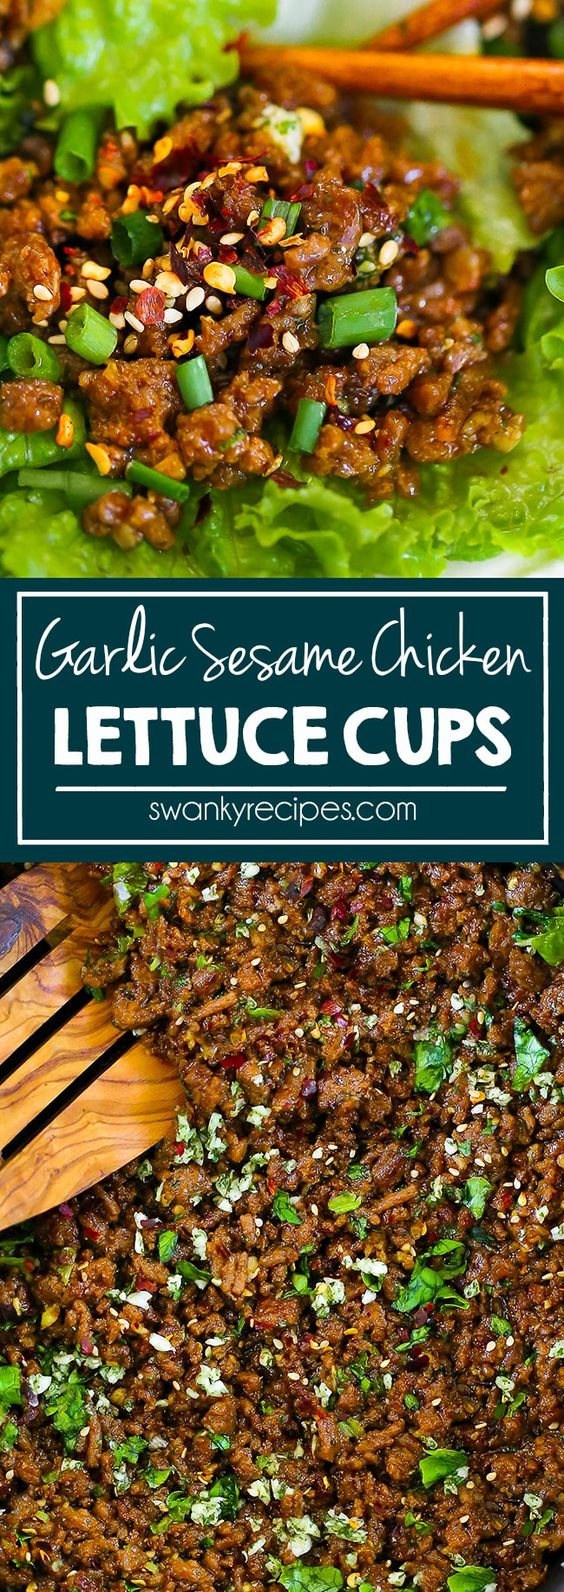 Garlic Sesame Chicken Lettuce Wraps